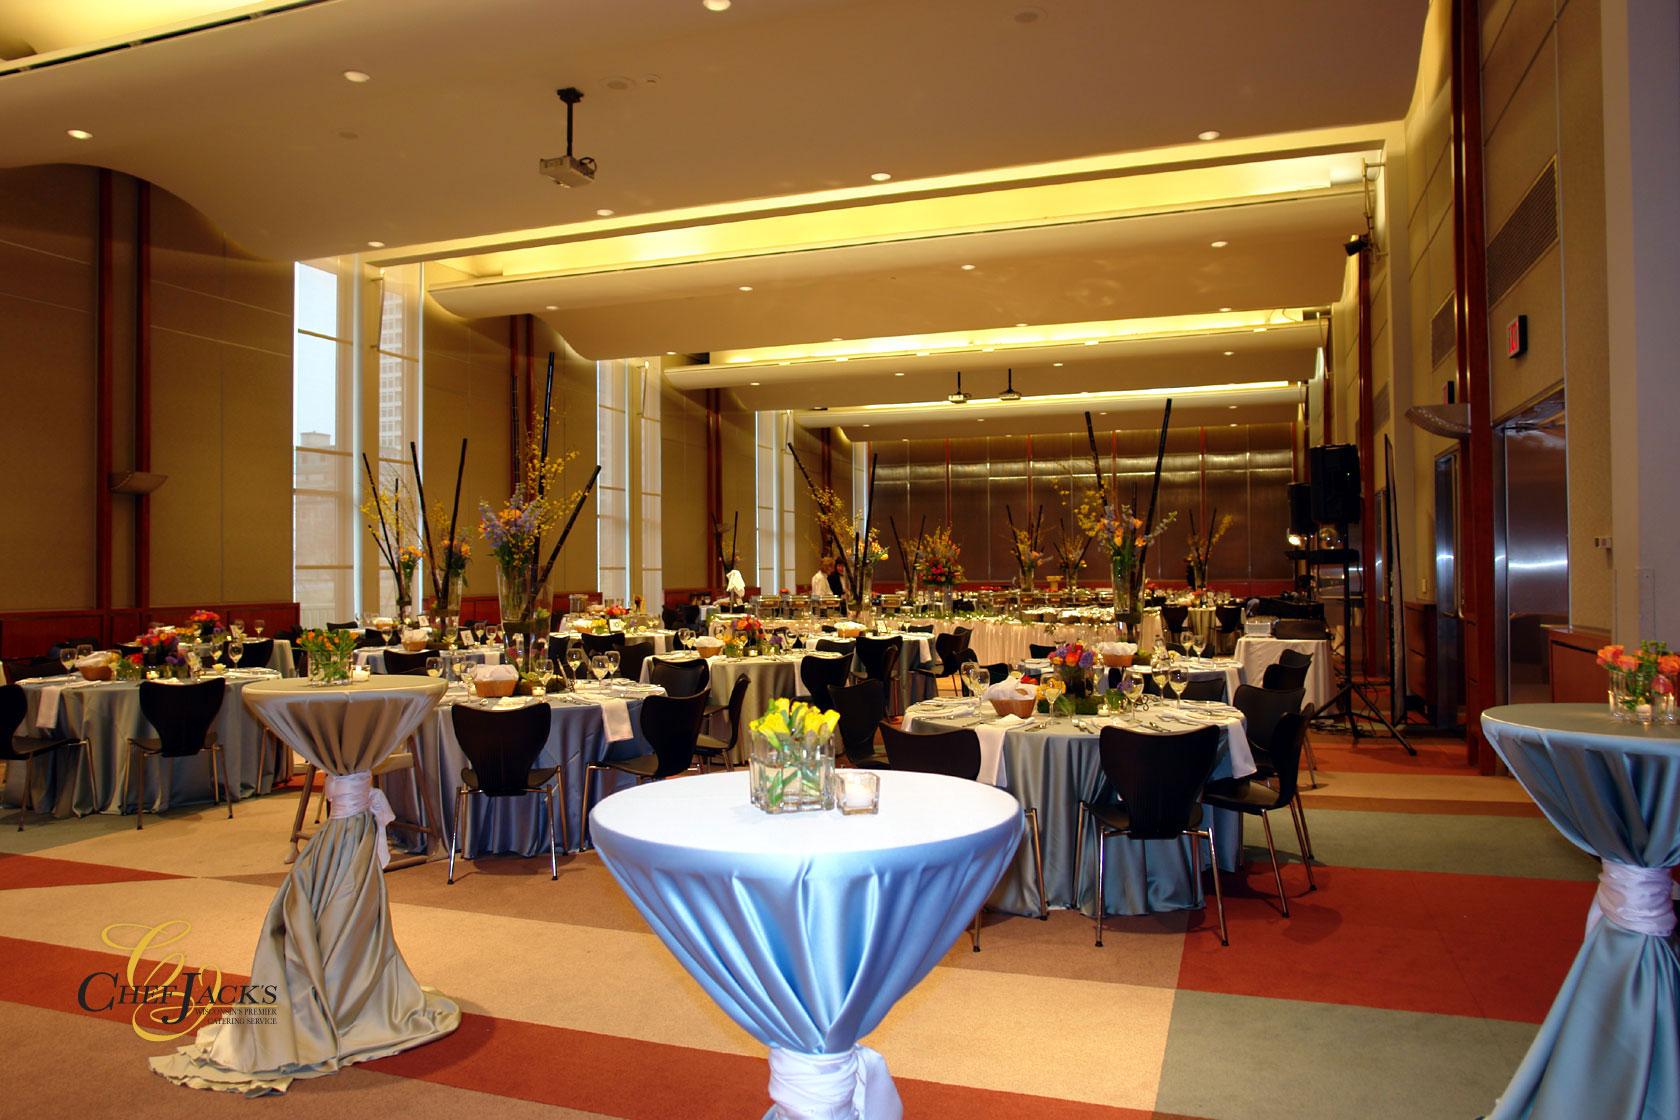 Wedding reception venues milwaukee wedding decor ideas stunning wedding reception venues milwaukee images styles ideas 2018 anafranil junglespirit Images